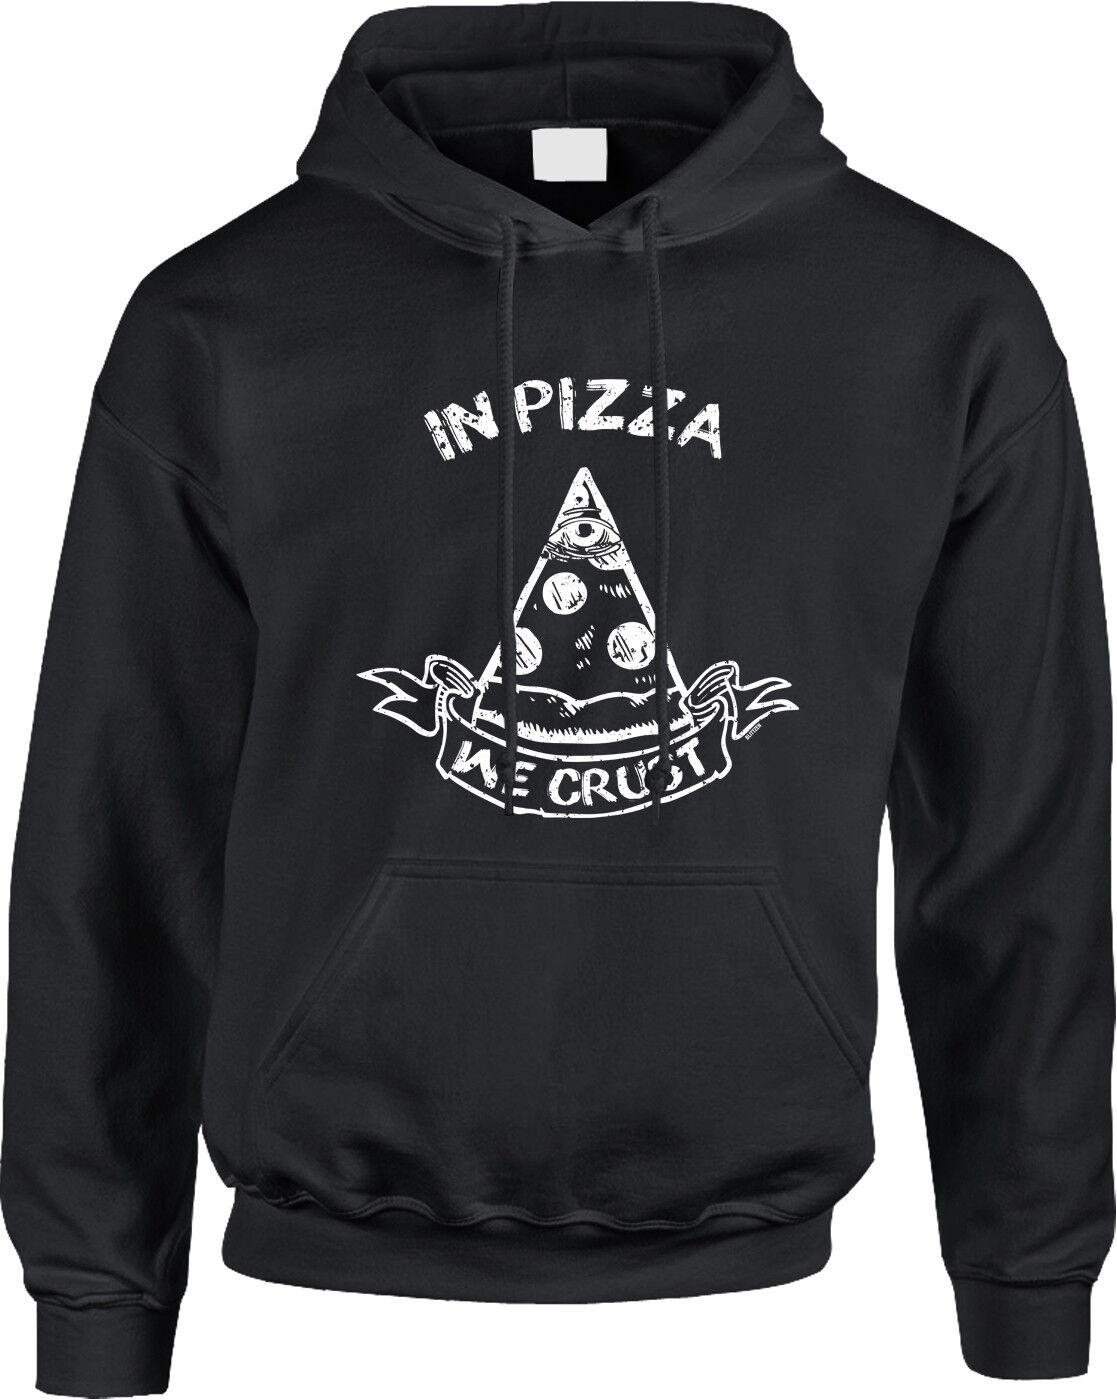 In Pizza We Crust Trust Illuminati Parody Joke Funny Humor Food Meme Mens Hoodie